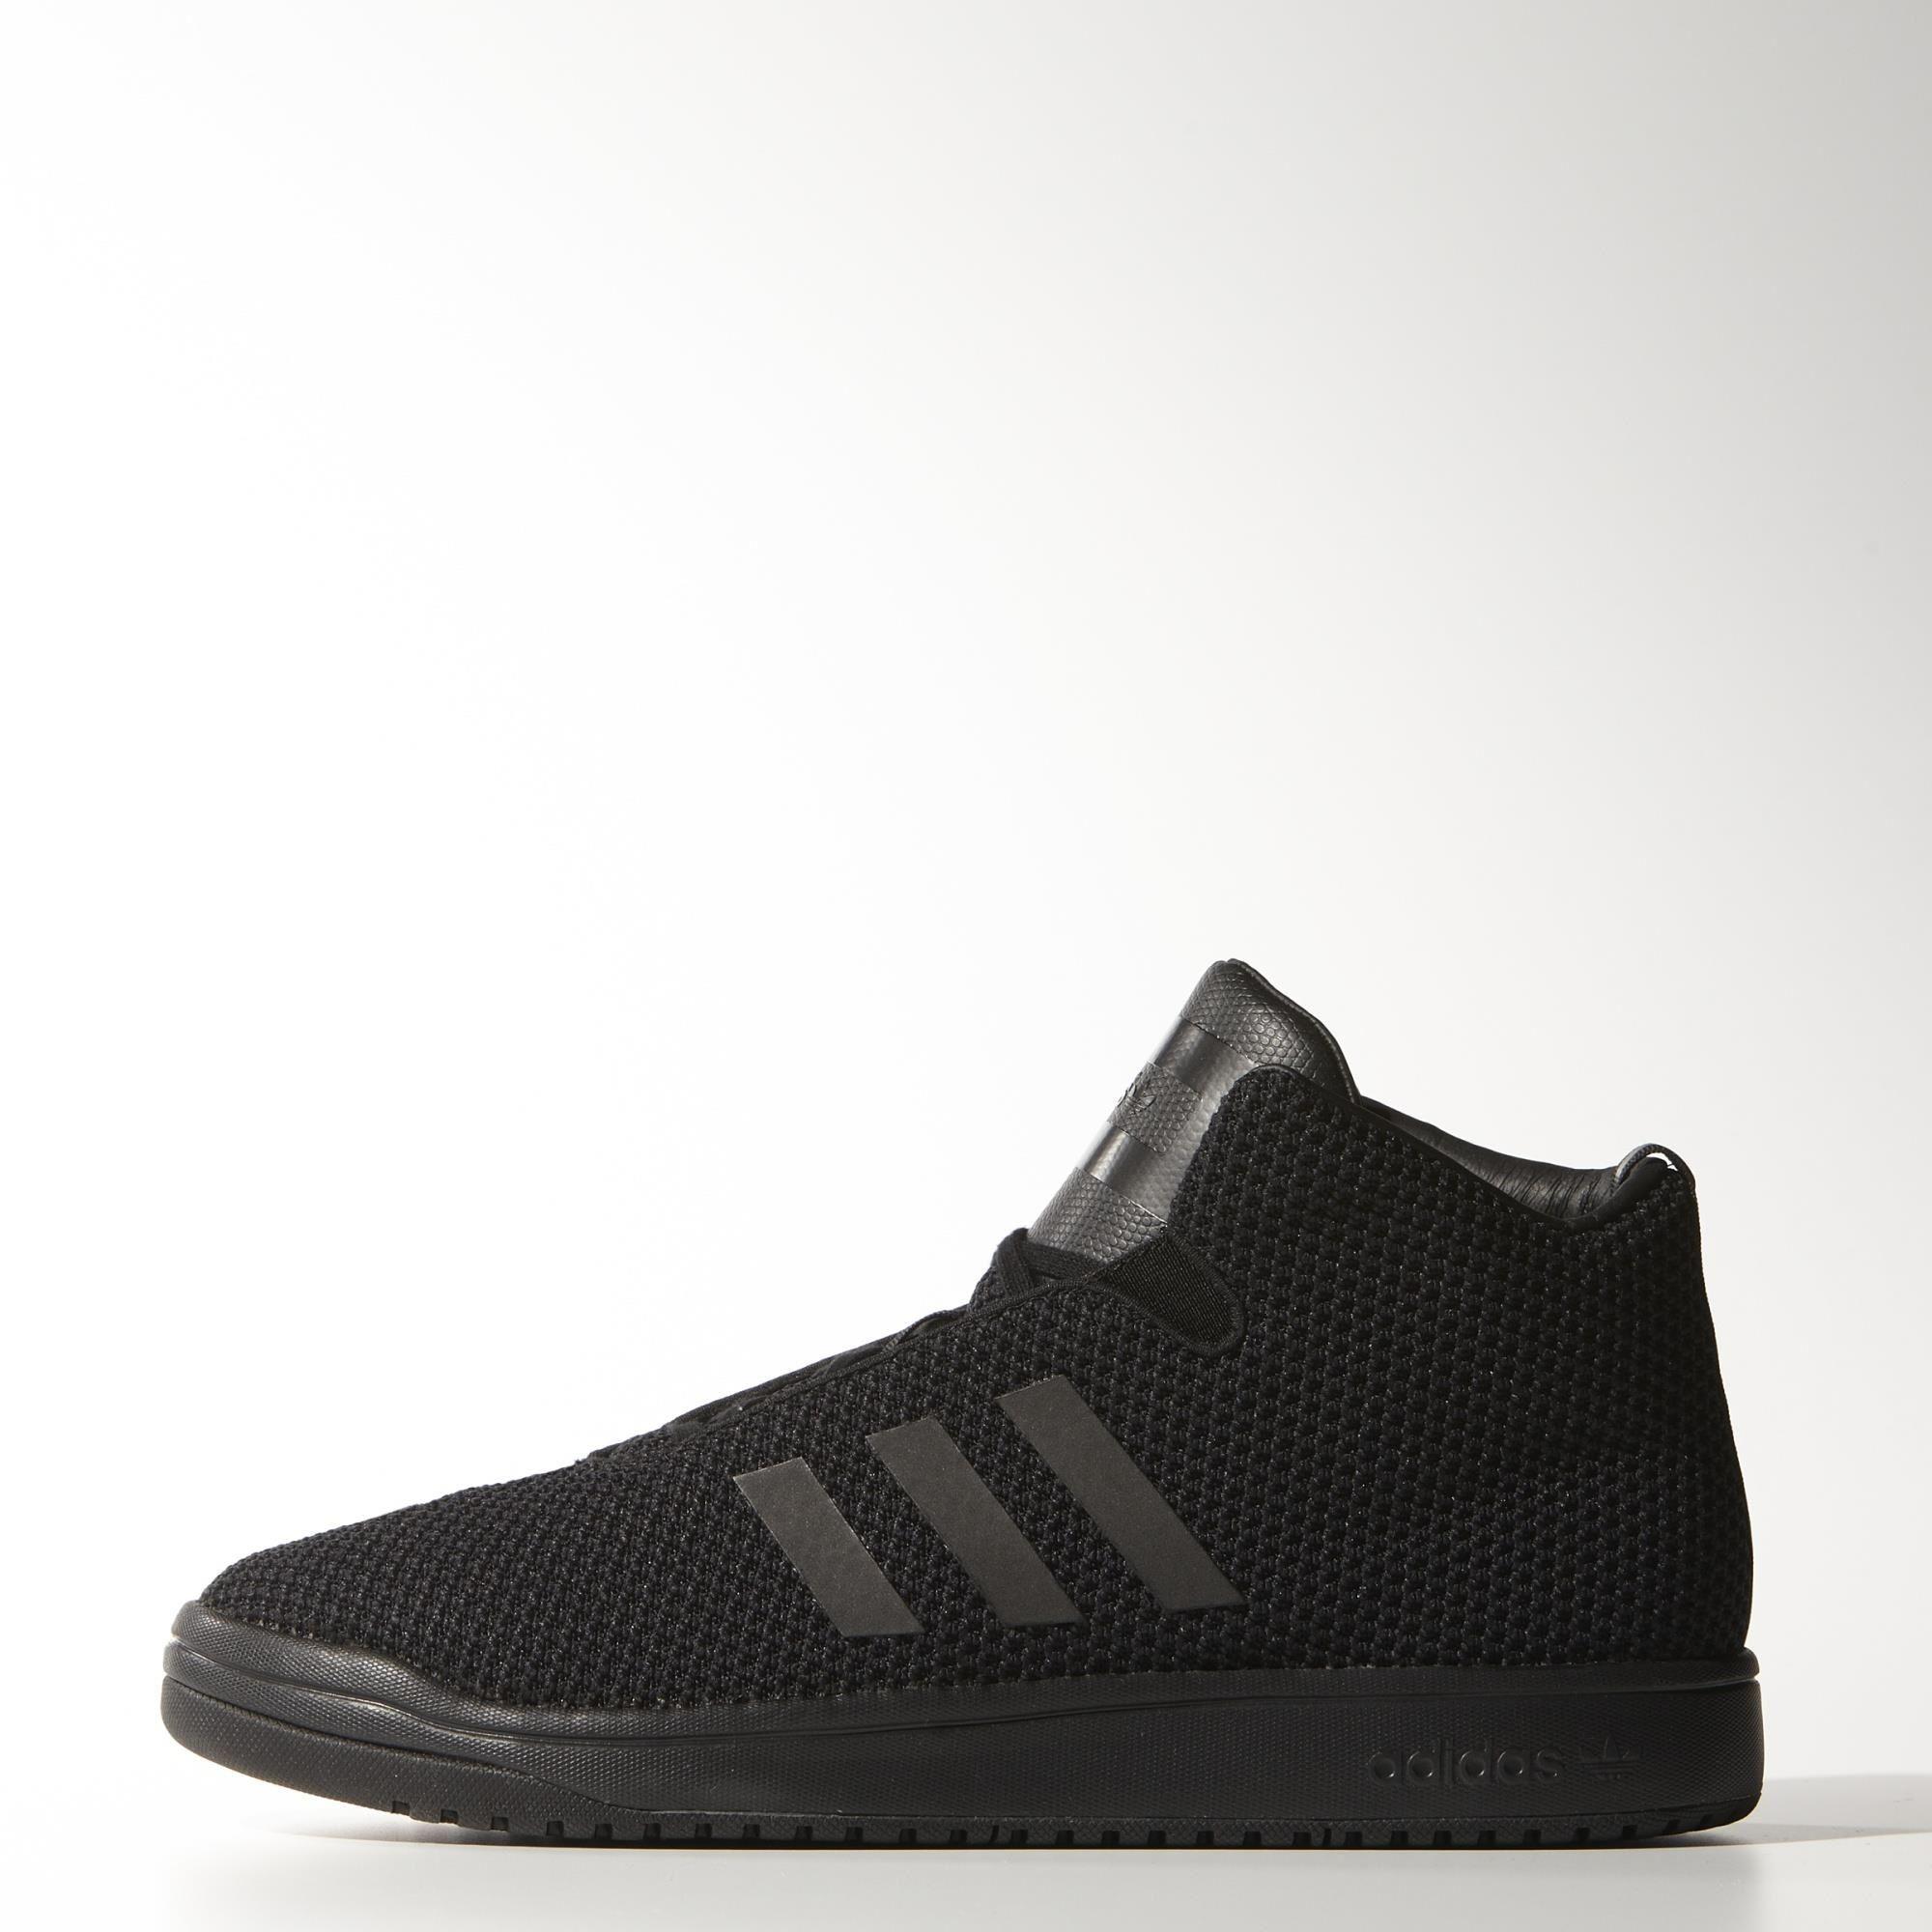 new adidas basketball shoes veritas press